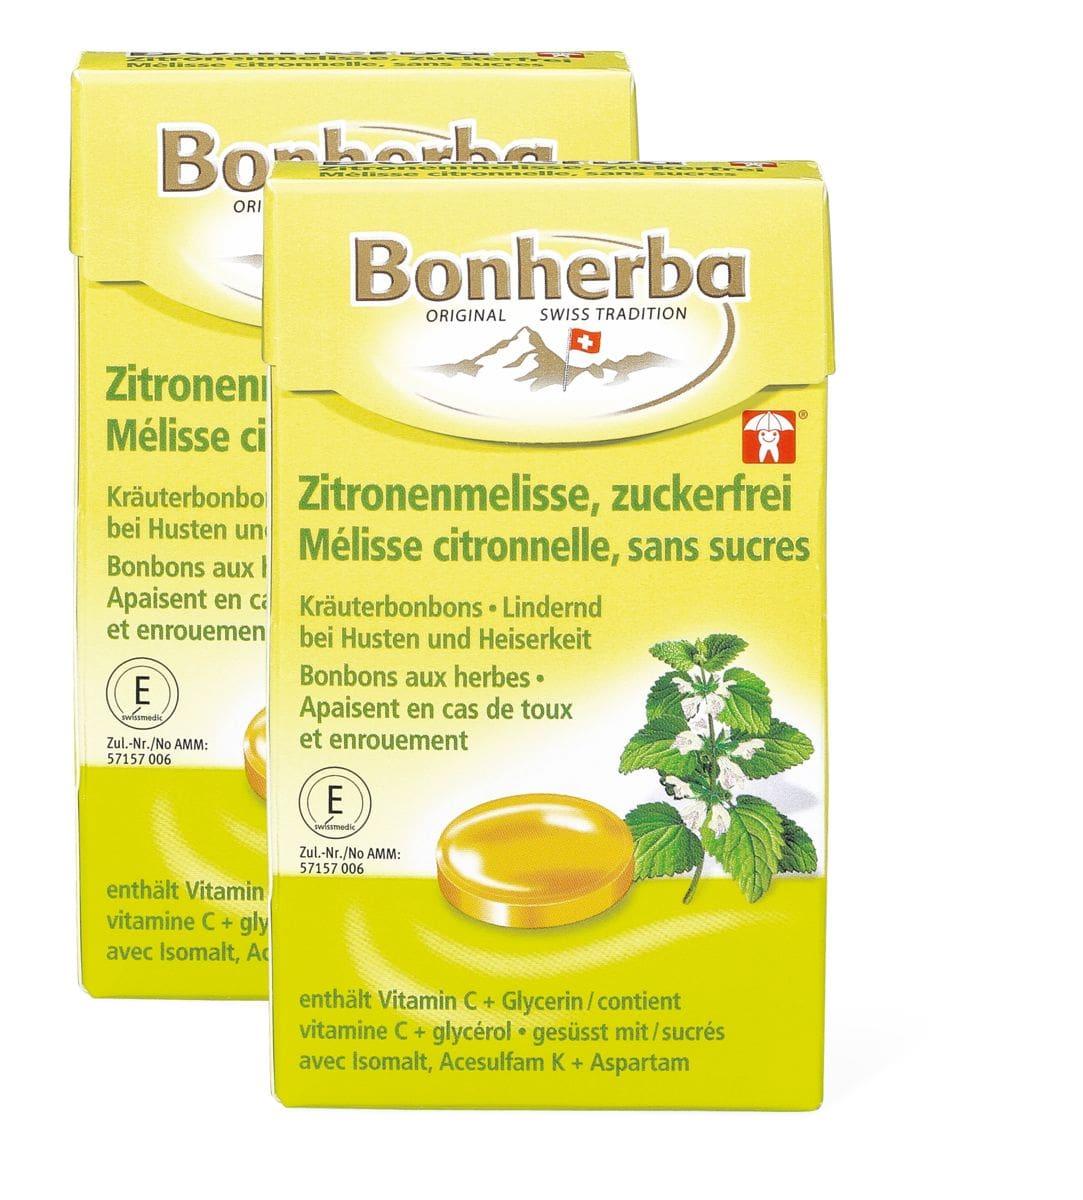 Bonherba Zitronenmelisse